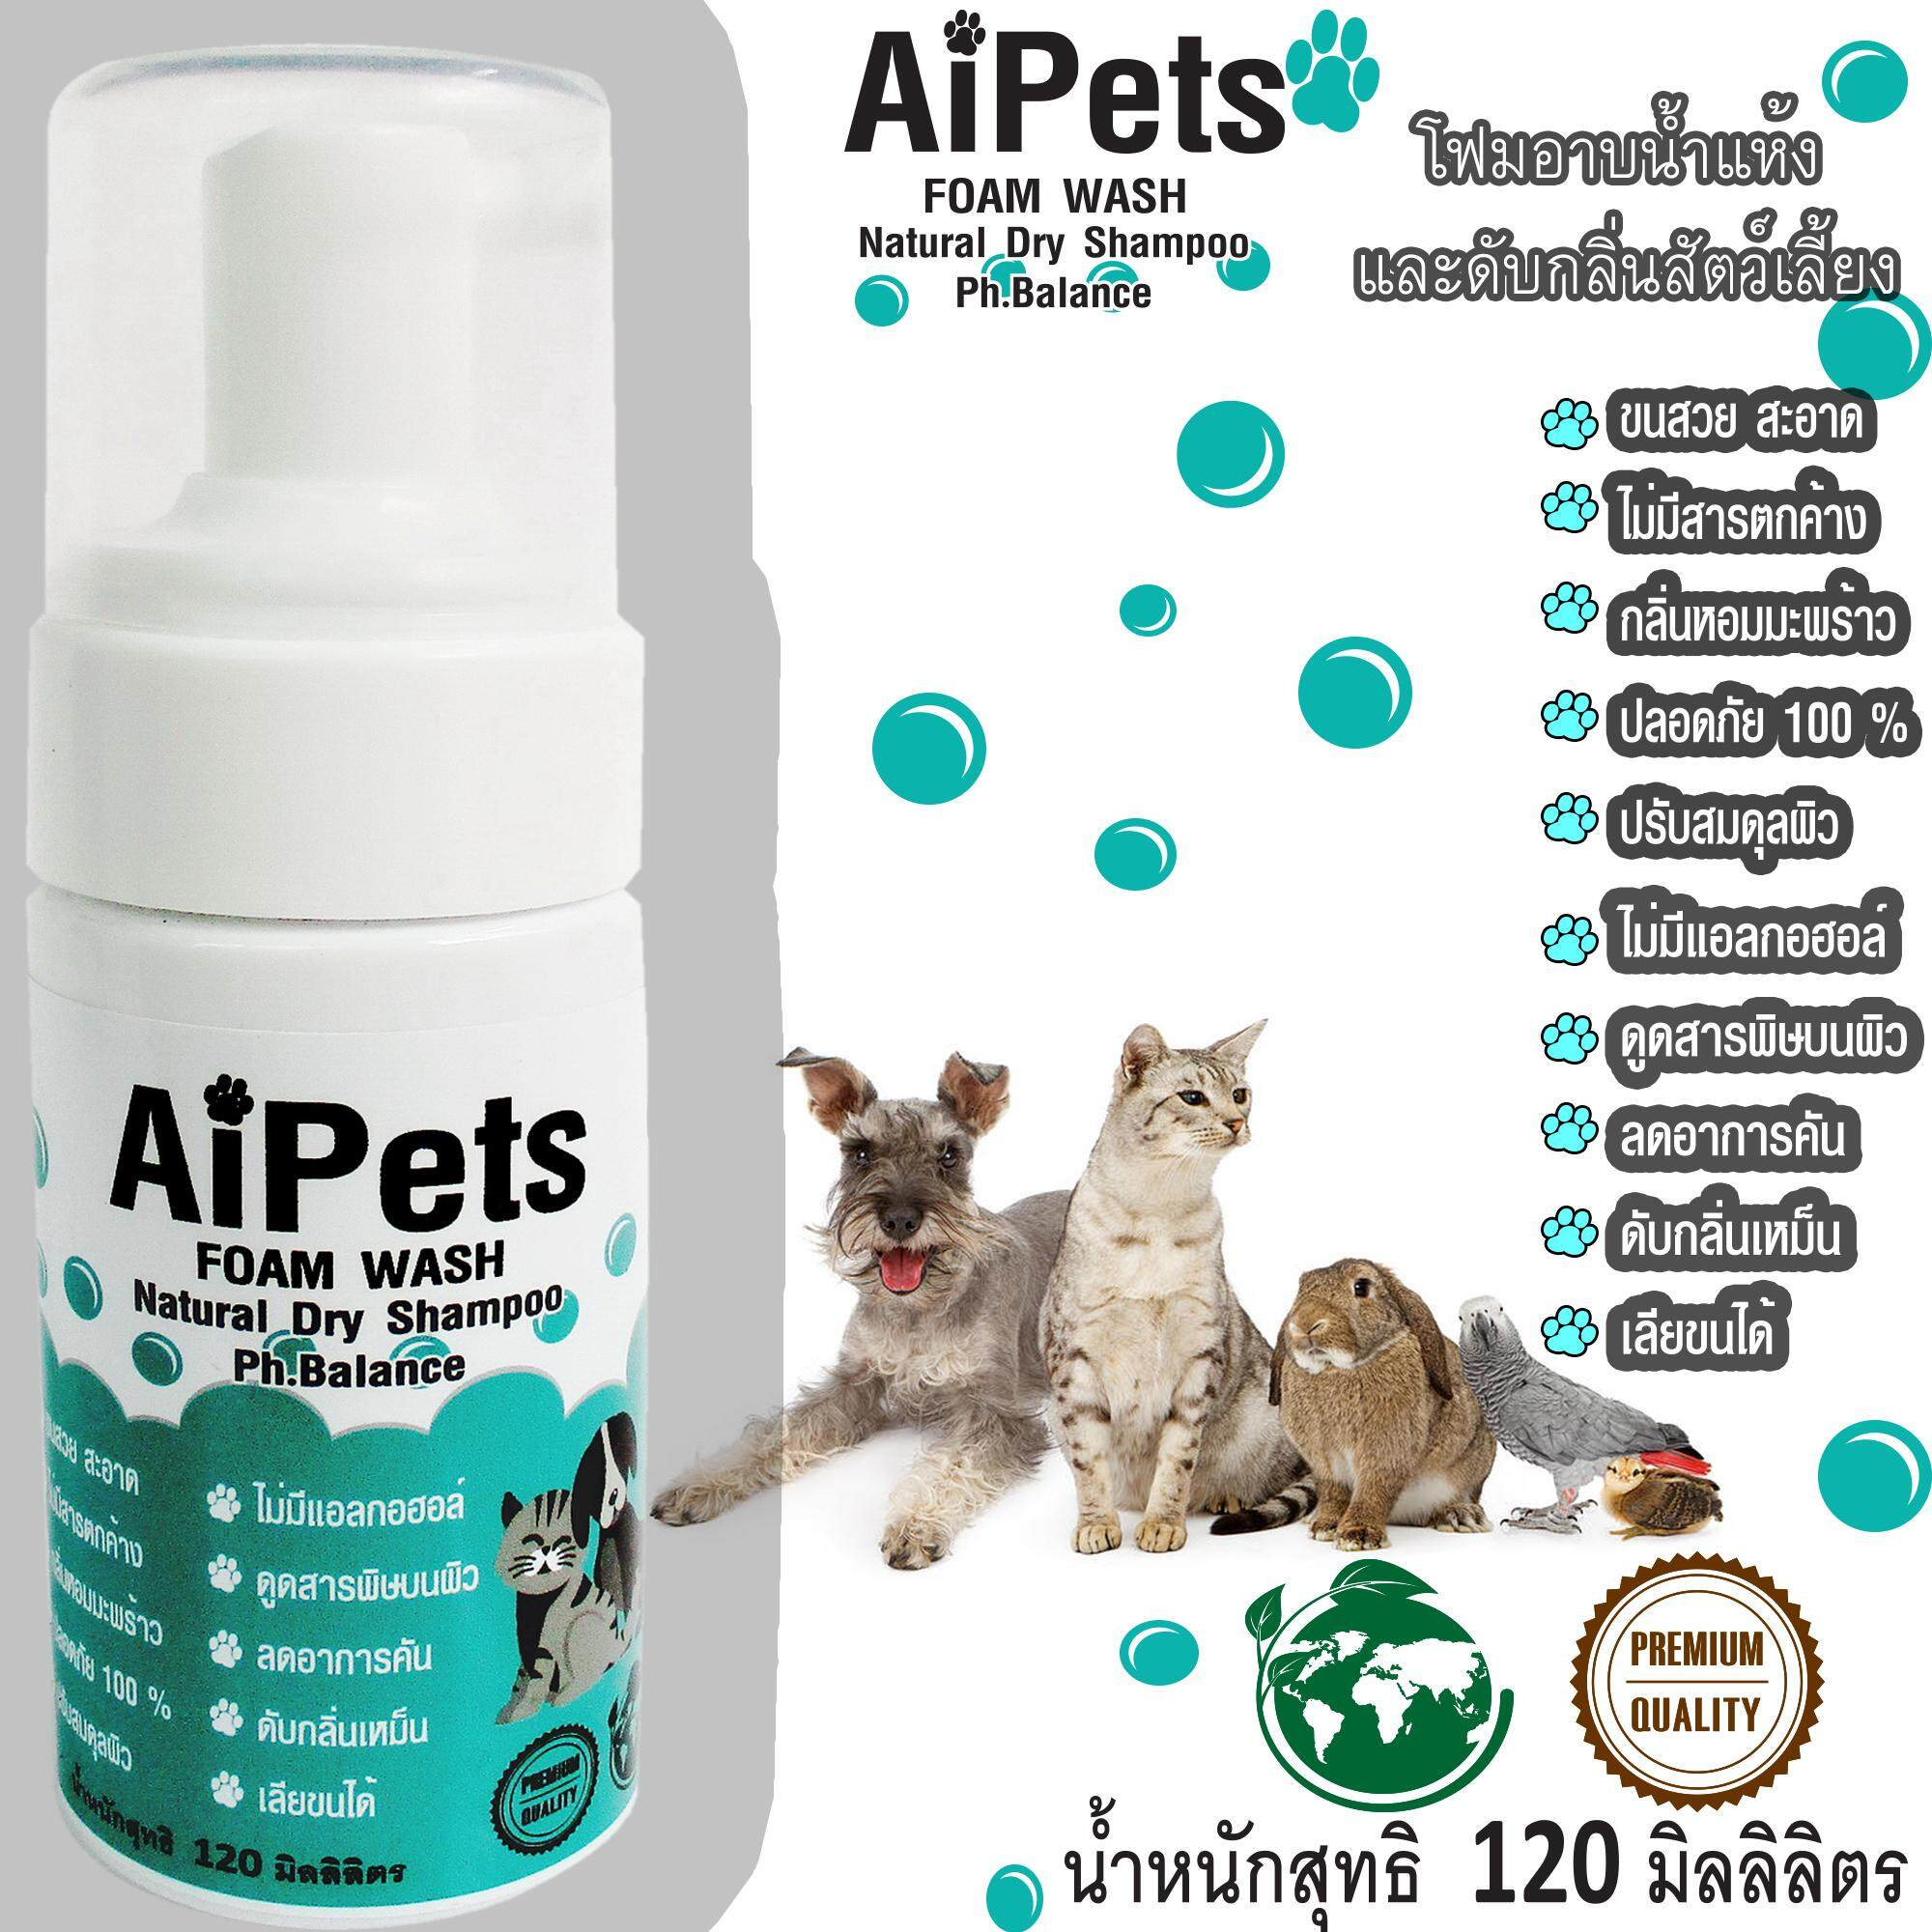 Aipetsโฟมอาบน้ำแห้งหมาแมวสูตรอ่อนโยน กลิ่นหอม ขนสวย สะอาด ดับกลิ่น ด้วยคุณภาพจากแร่ธาตุธรรมชาติที่ได้จากน้ำแร่คุณภาพสูง By Koratpattana Trading Company Limited.